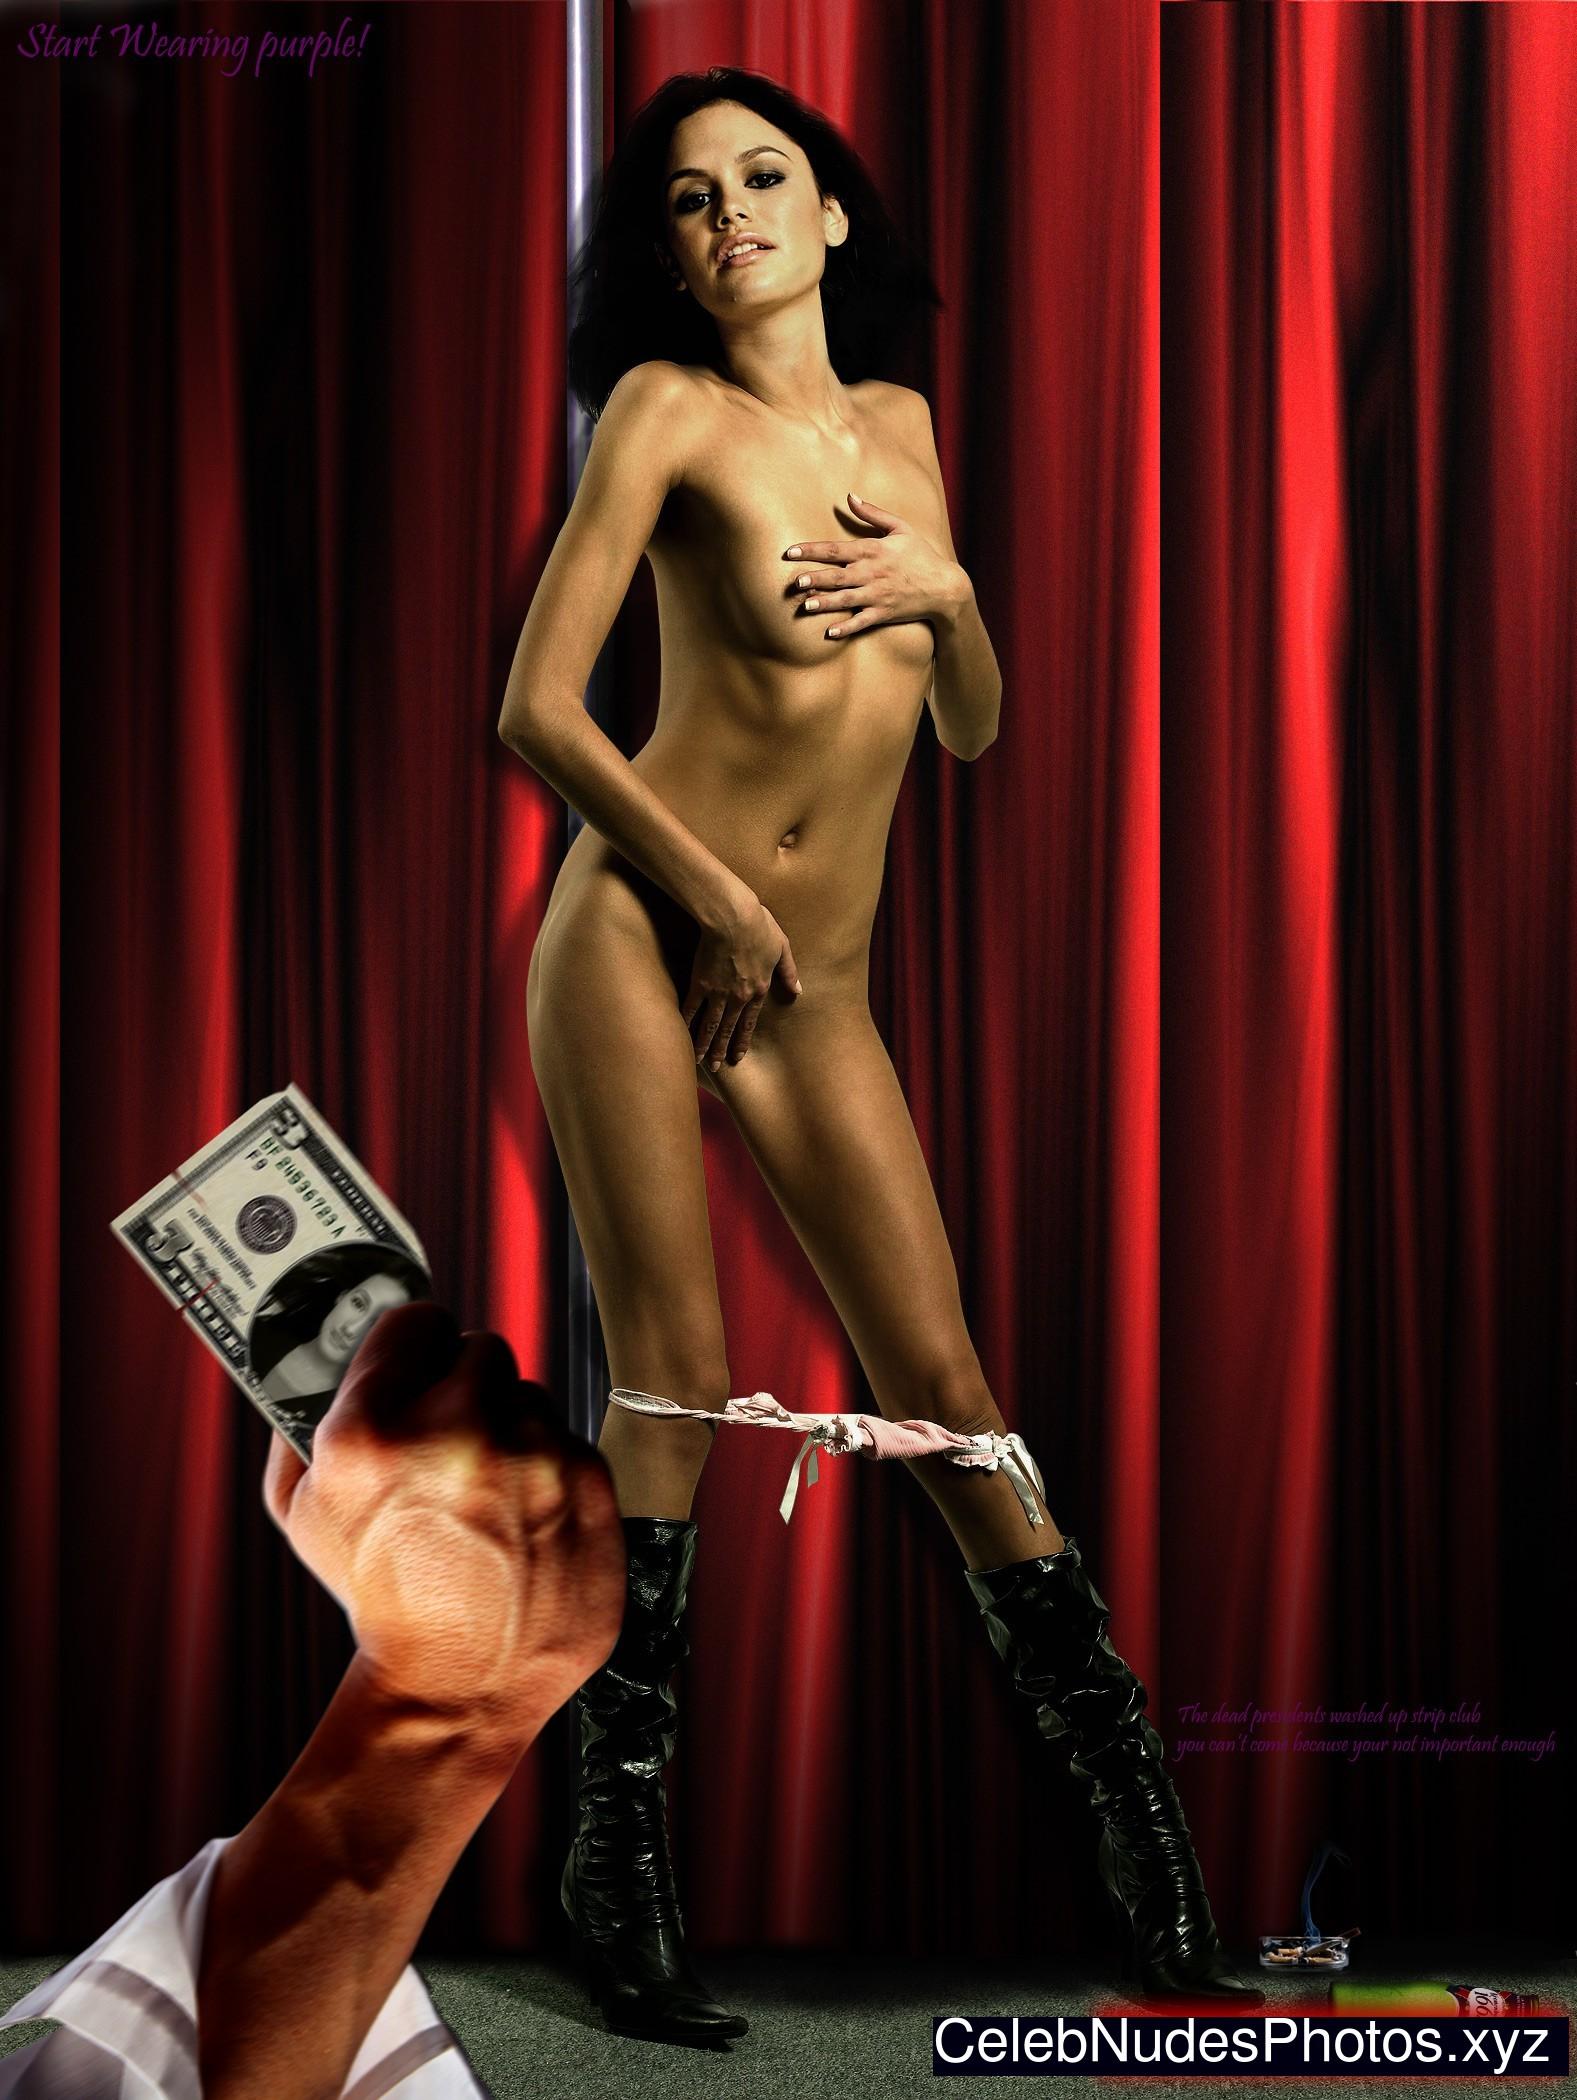 Rachel Bilson Celeb Nude sexy 4